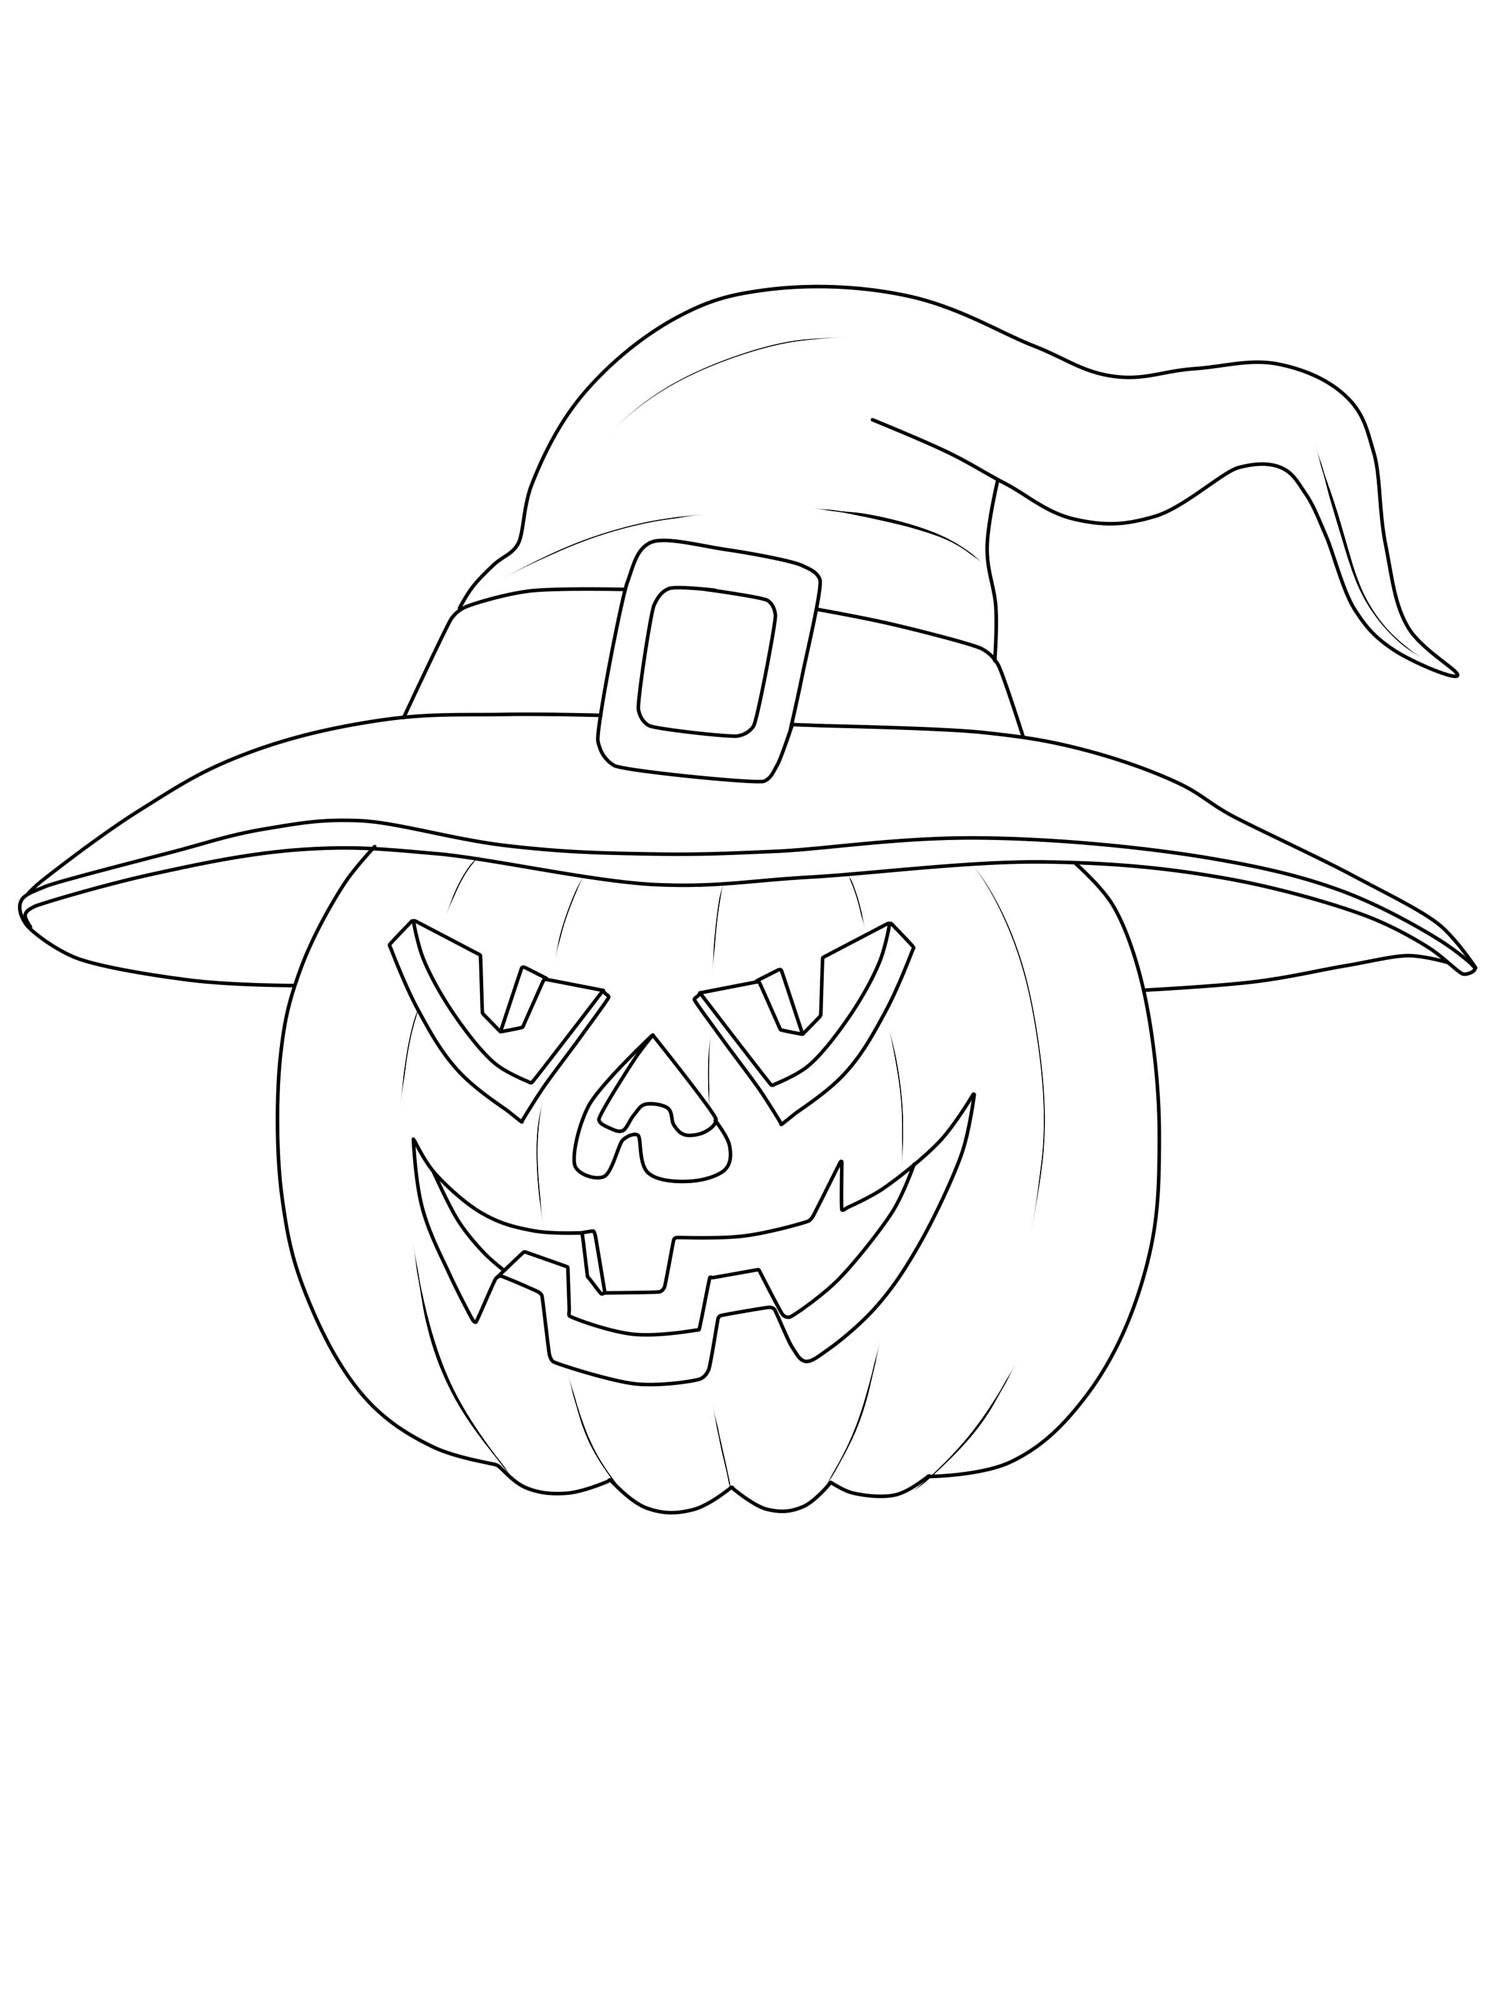 ausmalbild halloween kürbishexe ausmalen kostenlos bei